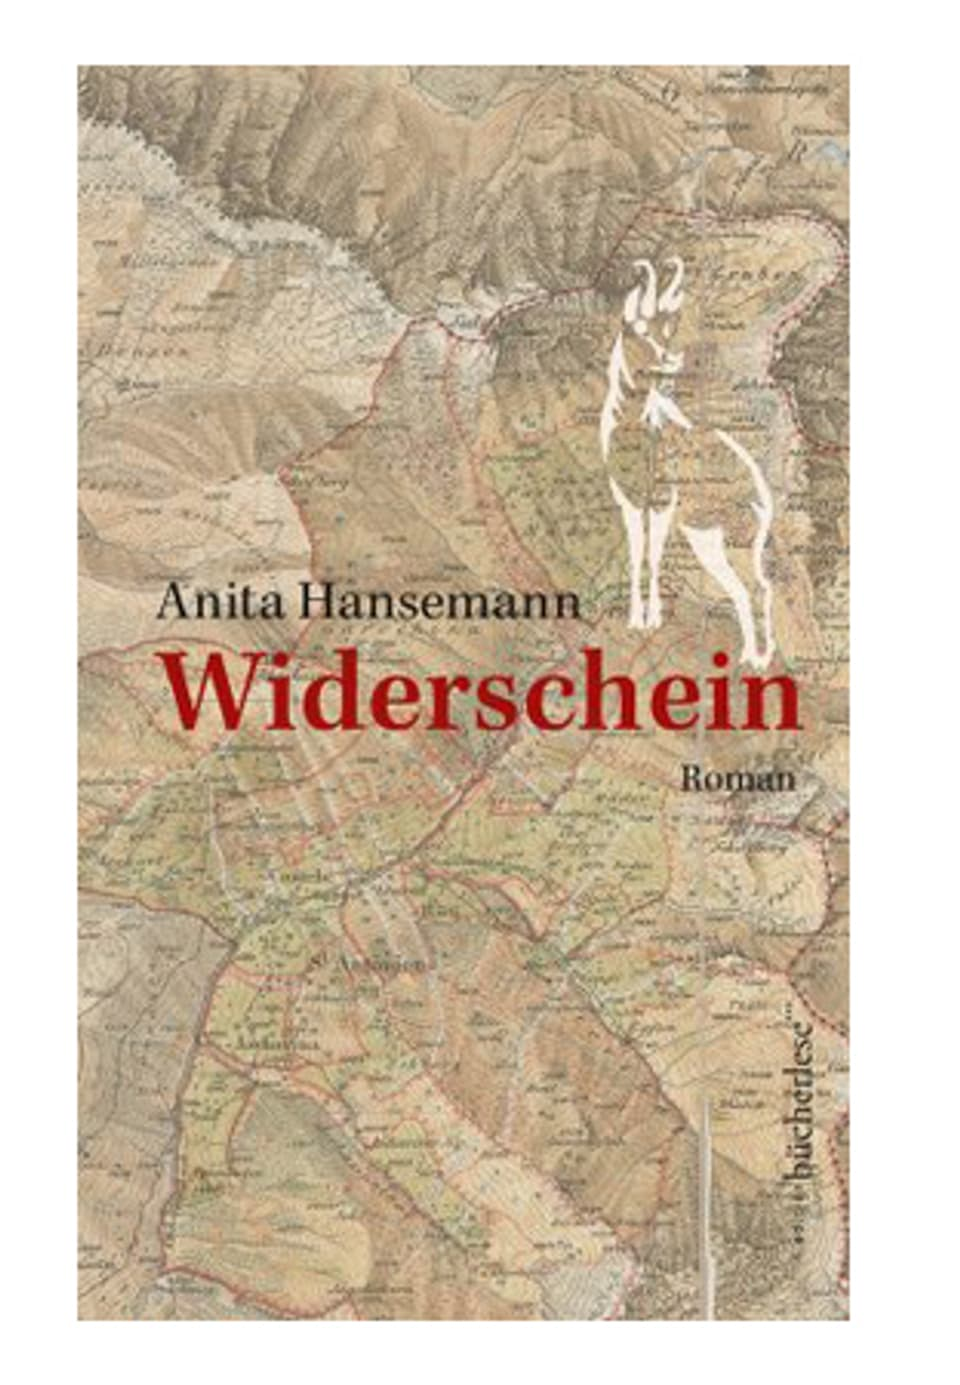 Il roman Widerschein gioga en il Partenz.